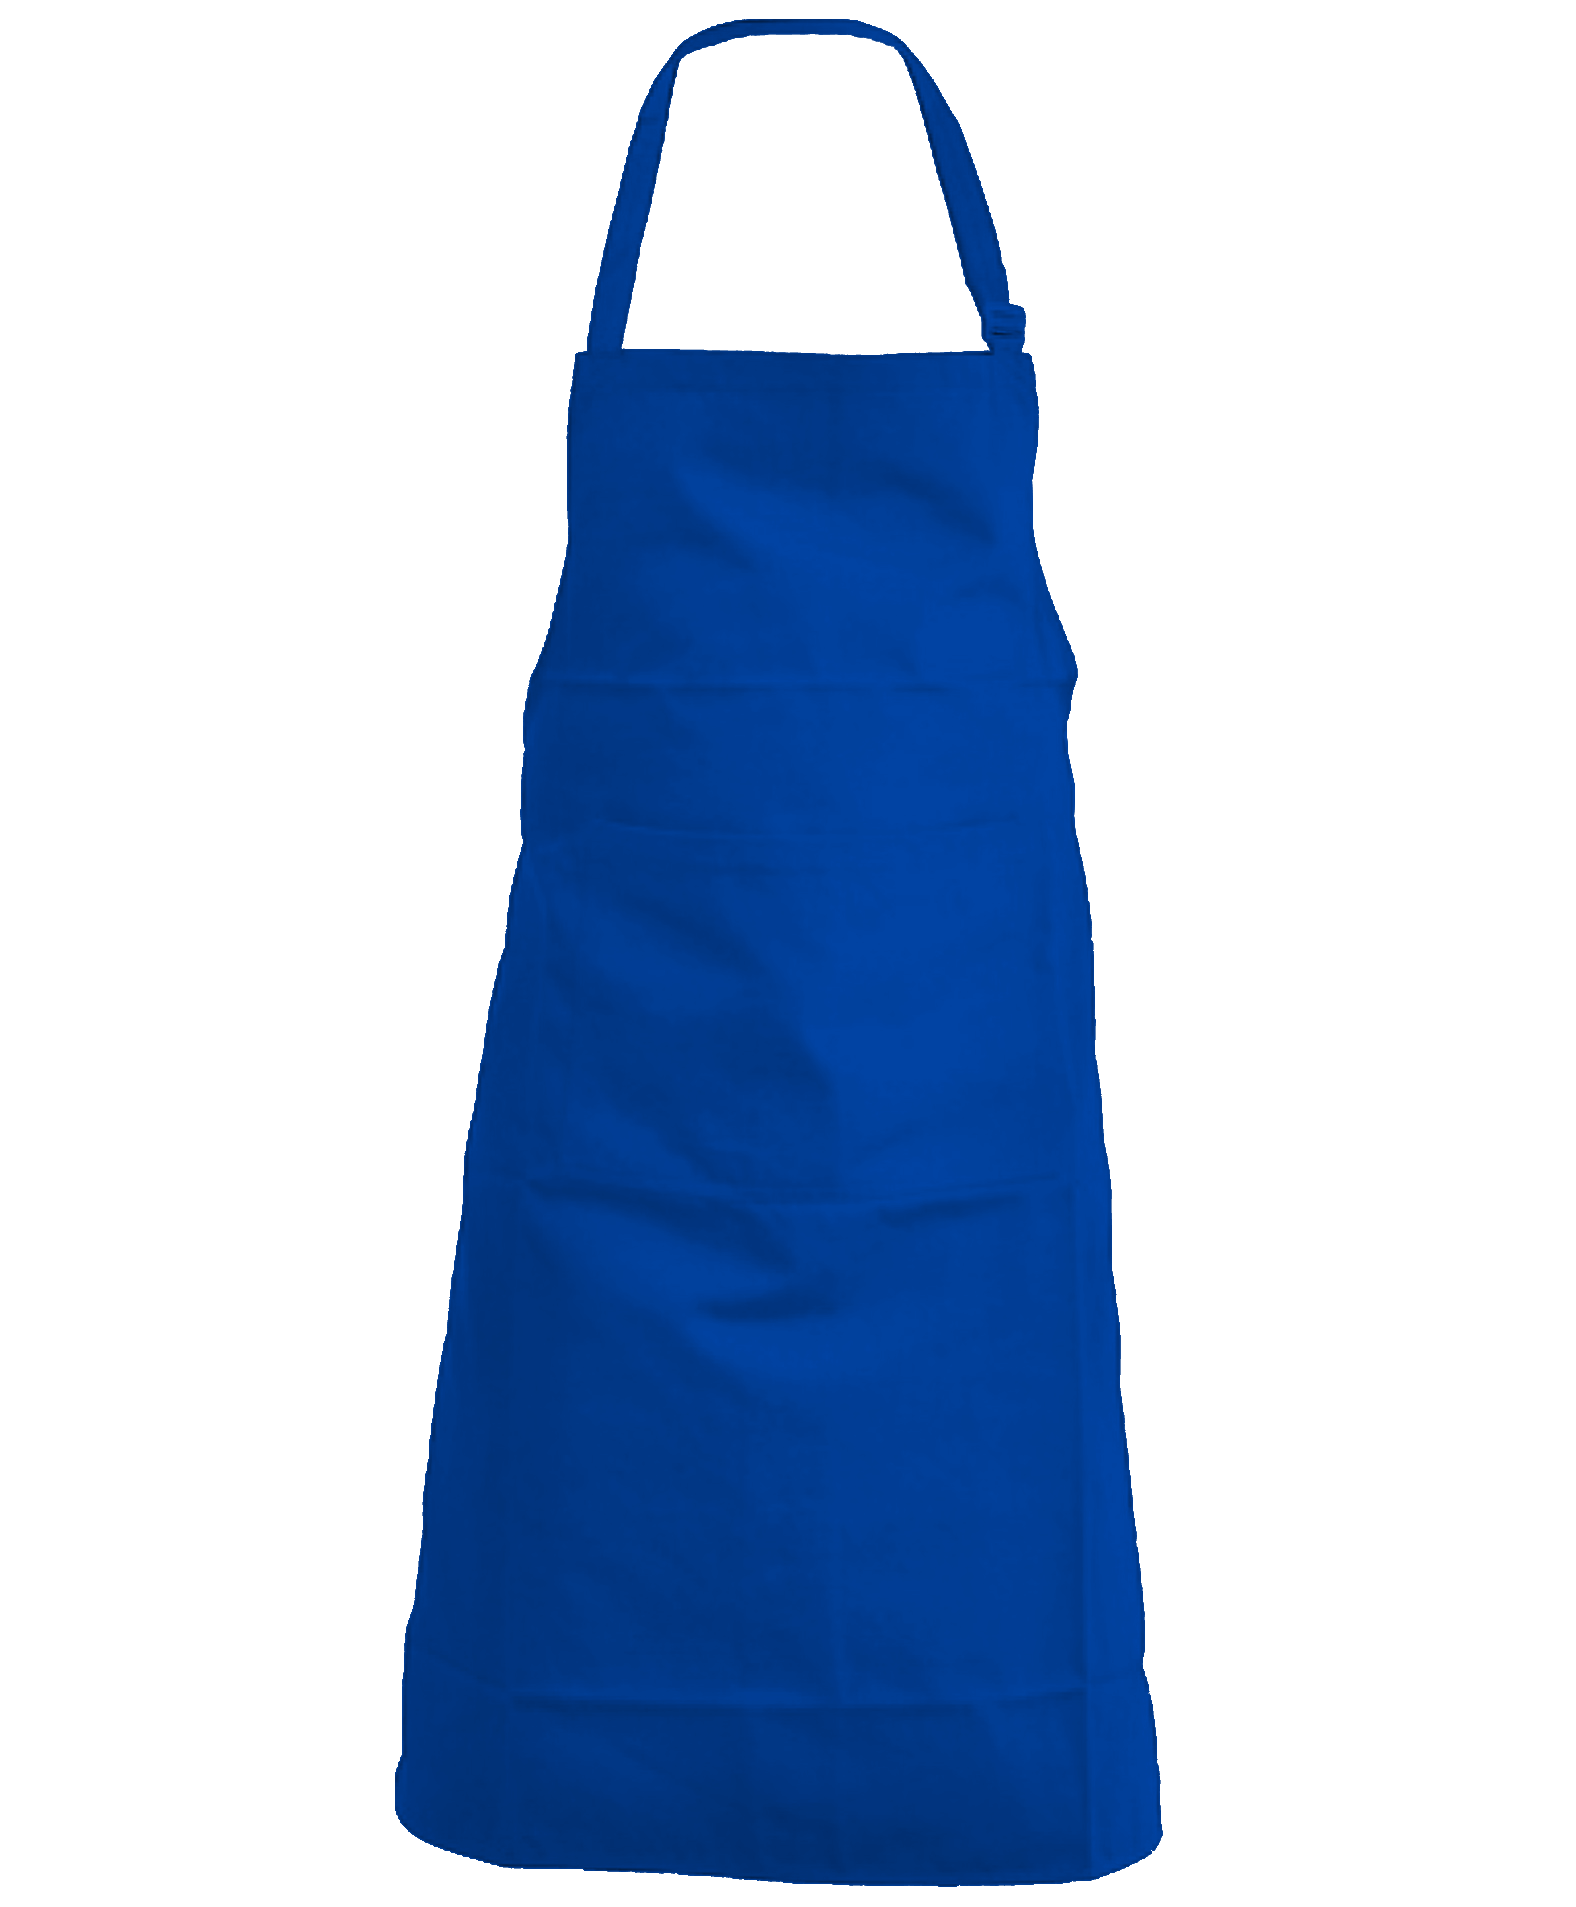 Blue apron ownership - Blue Apron Ownership 29